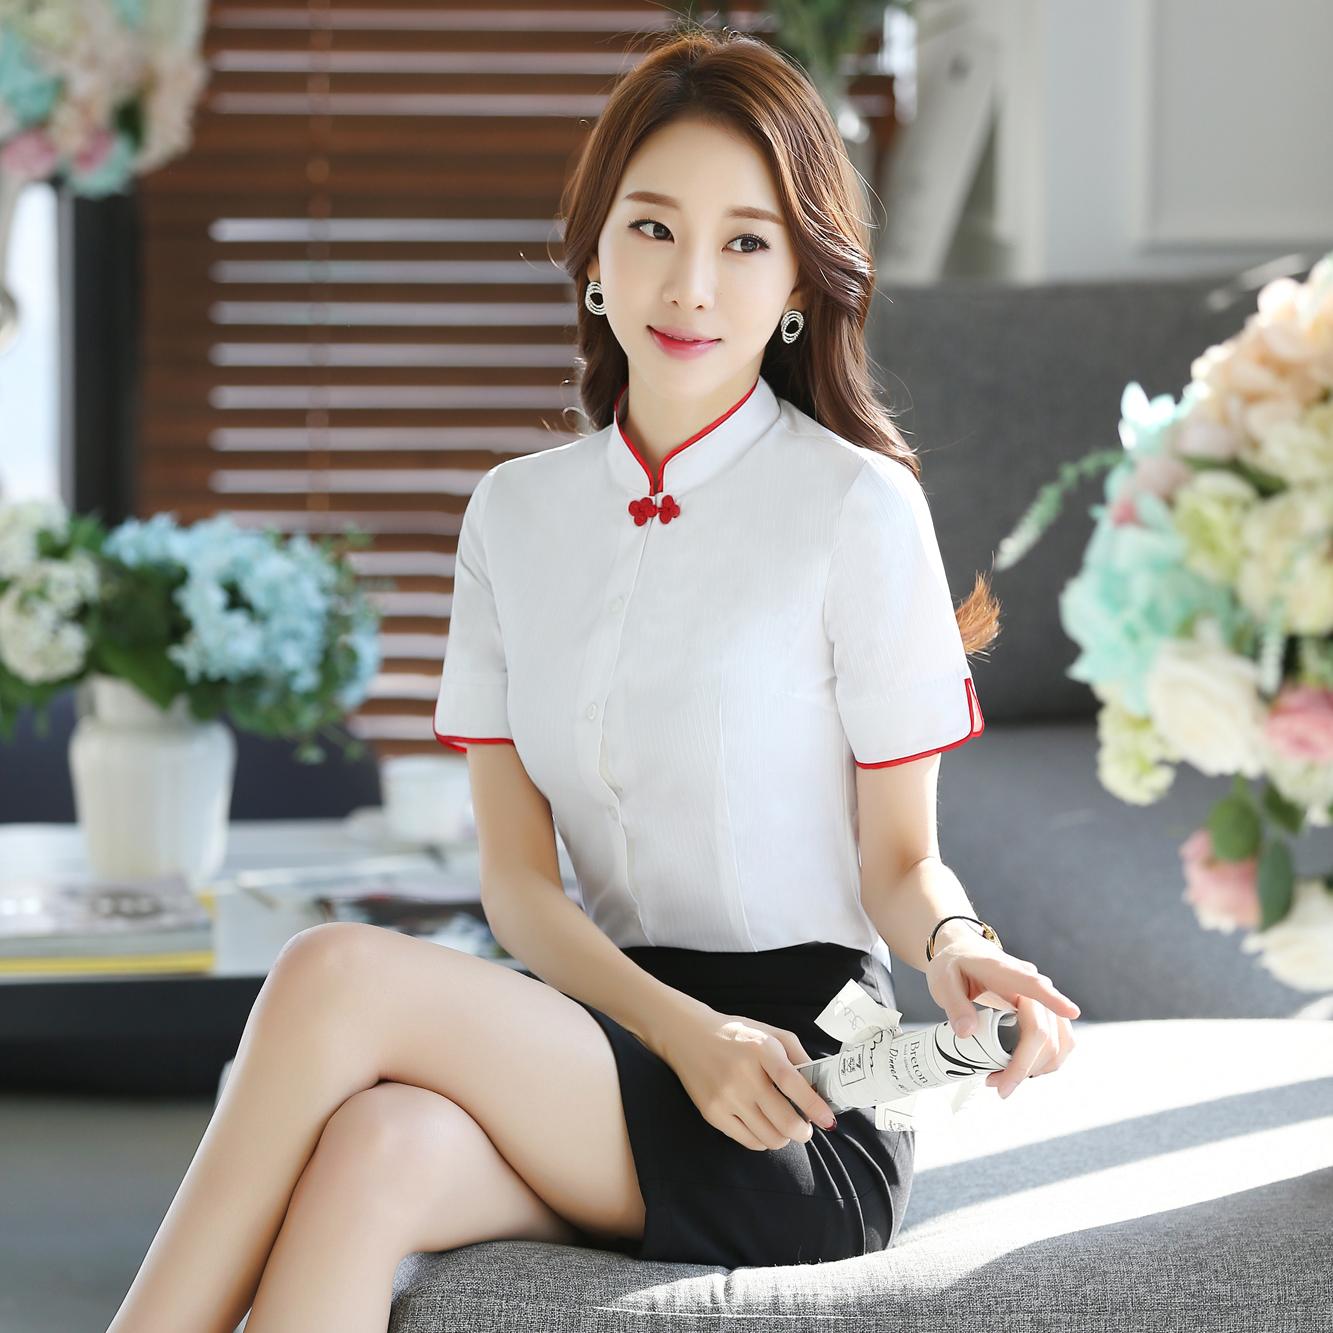 Customized White Shirt Short Sleeve womens work clothes professional shirt half sleeve slim summer standing collar button cotton suit ol